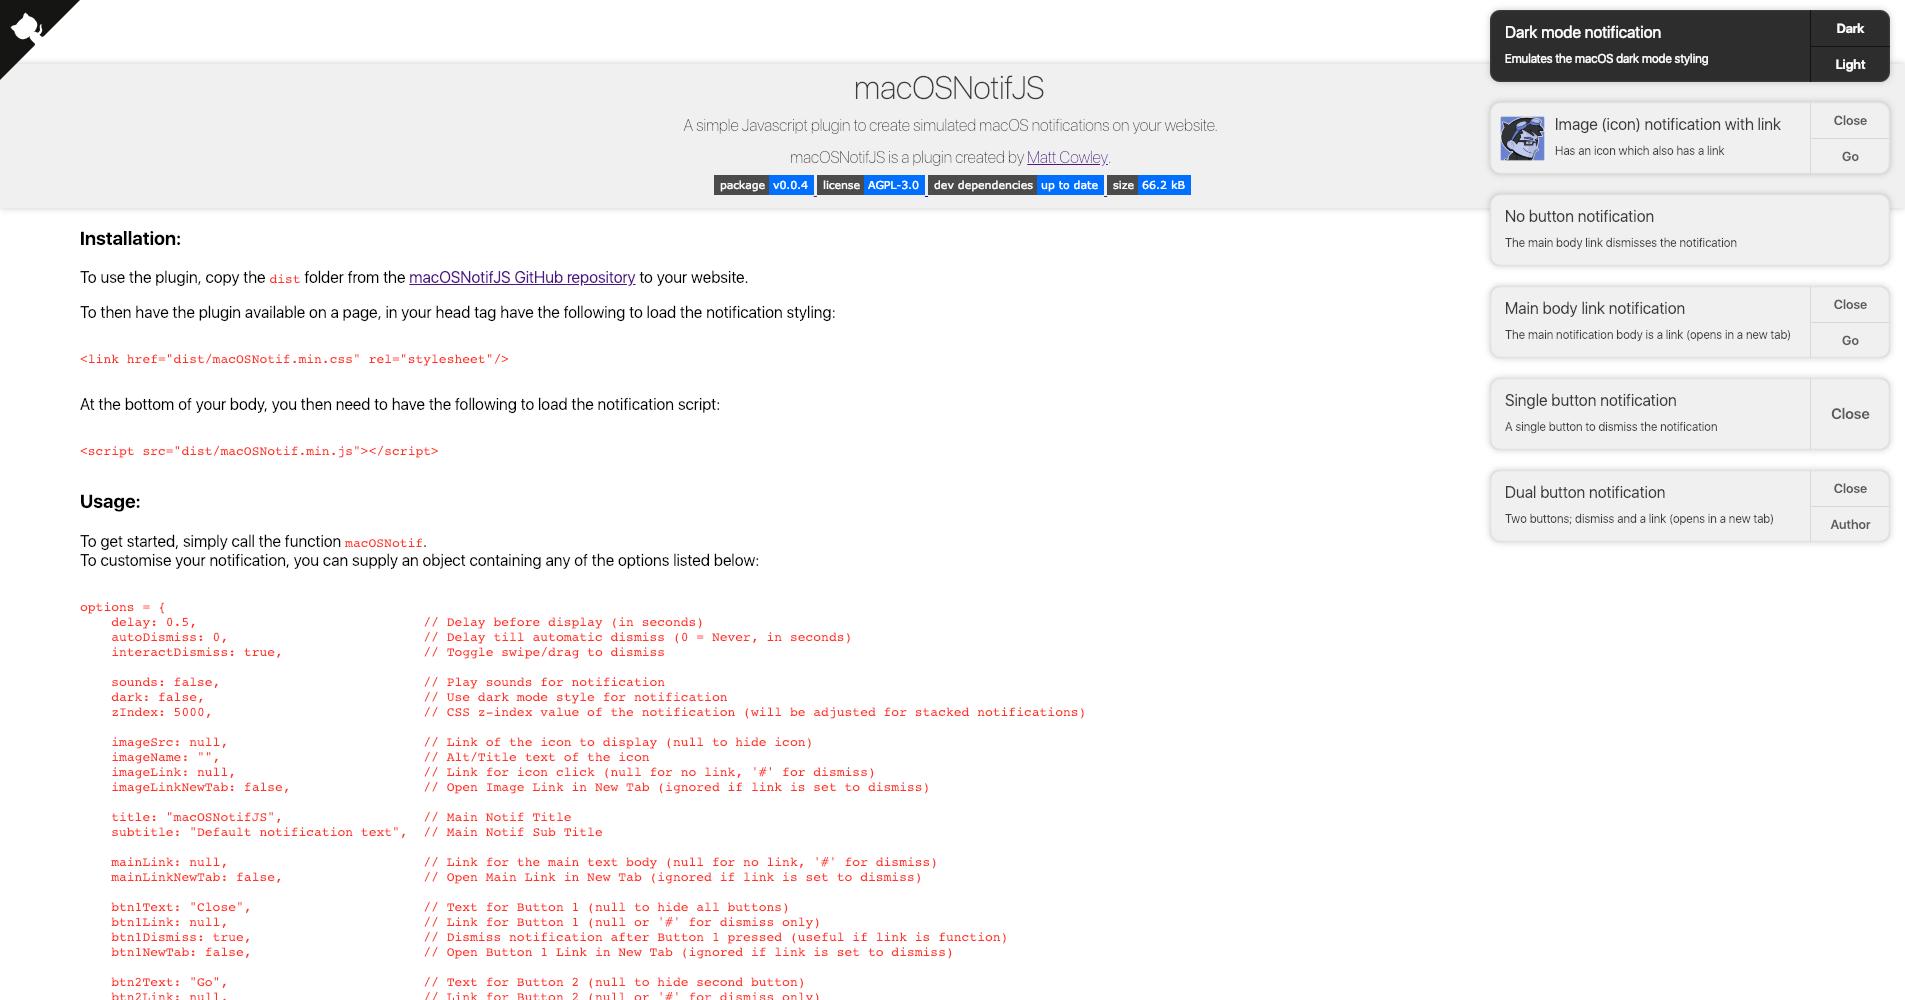 GitHub - MattIPv4/macOSNotifJS: A simple Javascript plugin